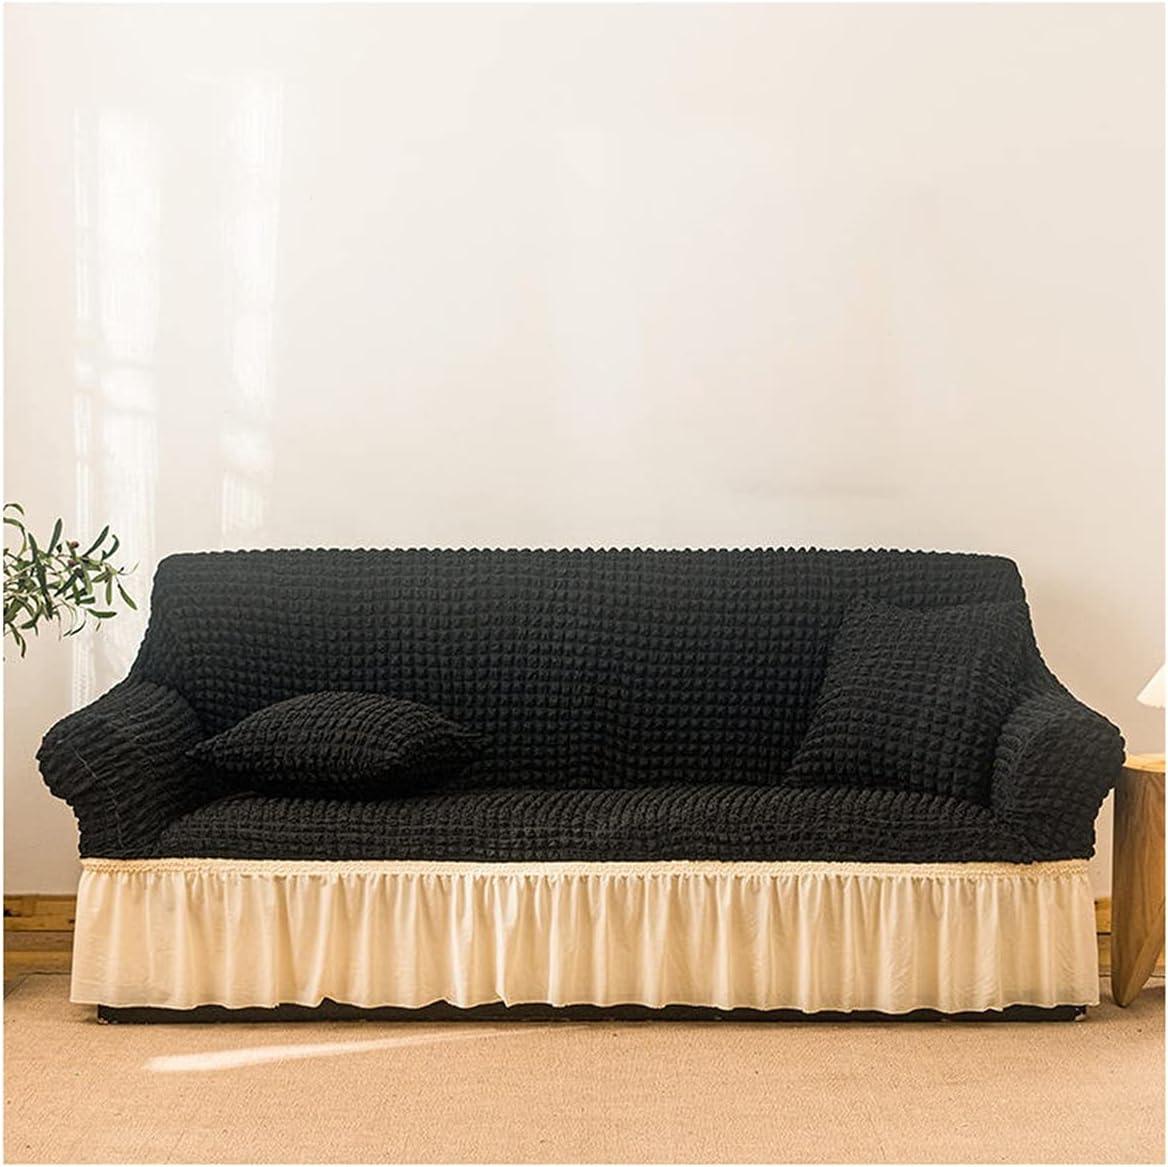 LYLSXY Bubble Lattice Elegant Topics List price on TV Cover Loveseat Sofa Stretch